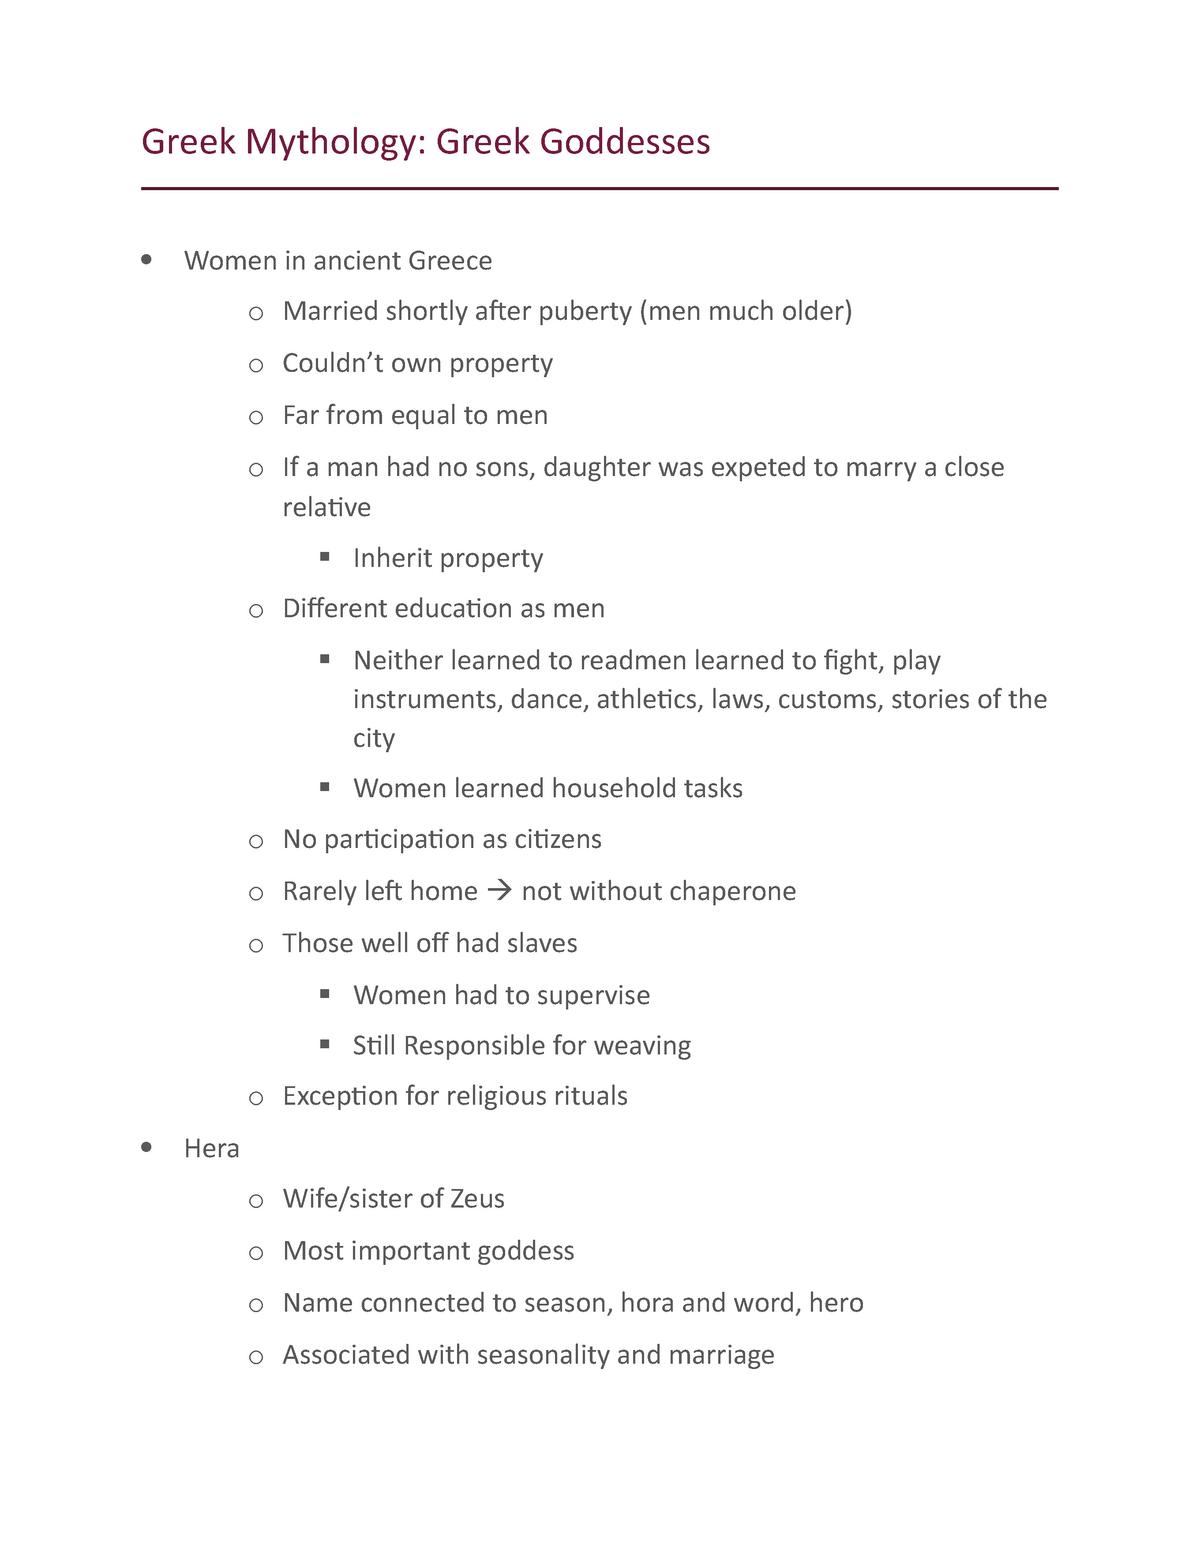 Greek goddesses - CLAS 220: Introduction to Classical Mythology